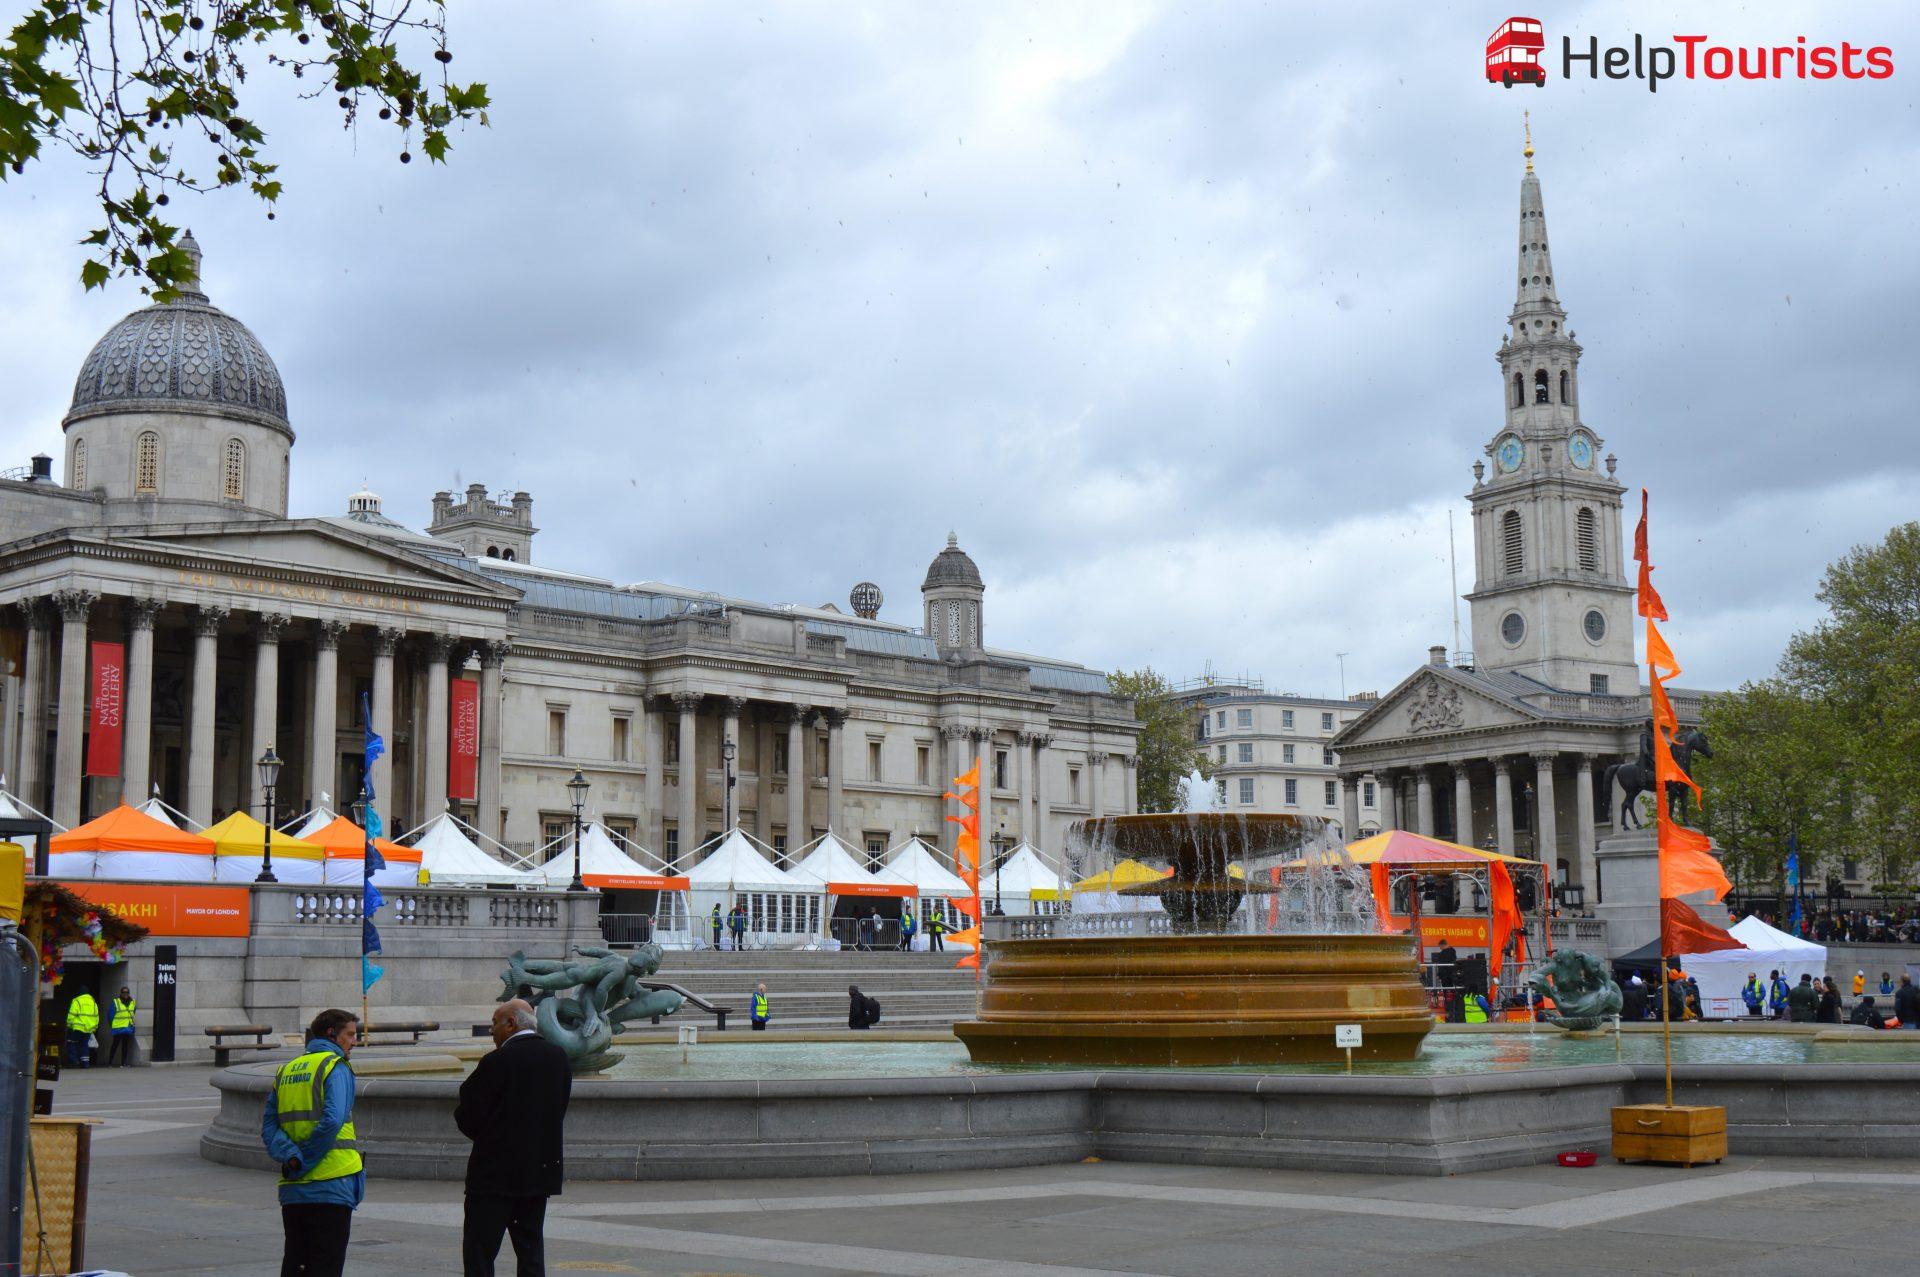 London Festival am Trafalgar Platz